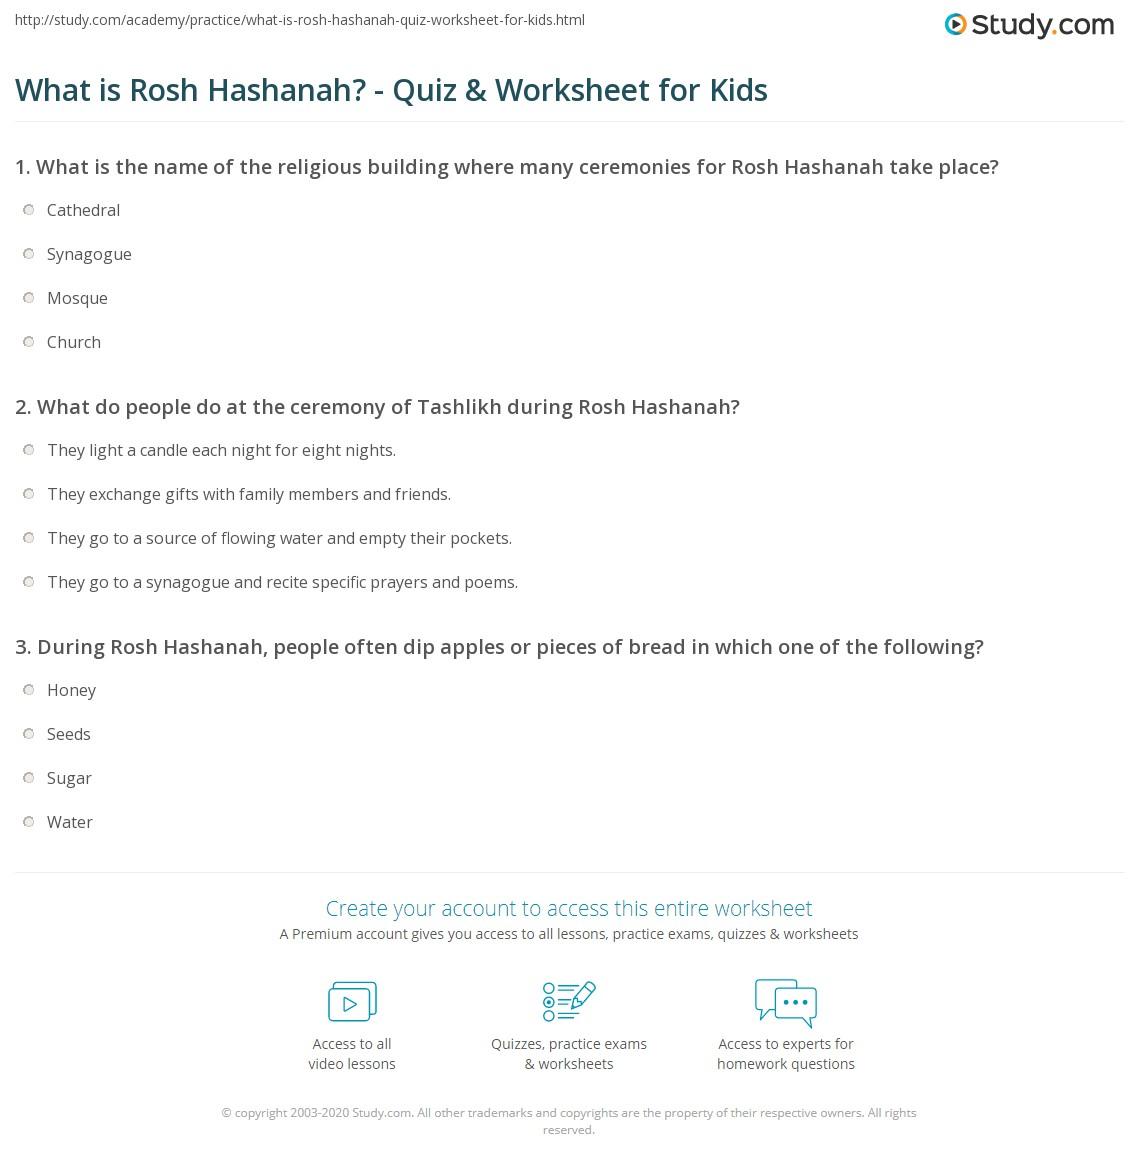 What Is Rosh Hashanah